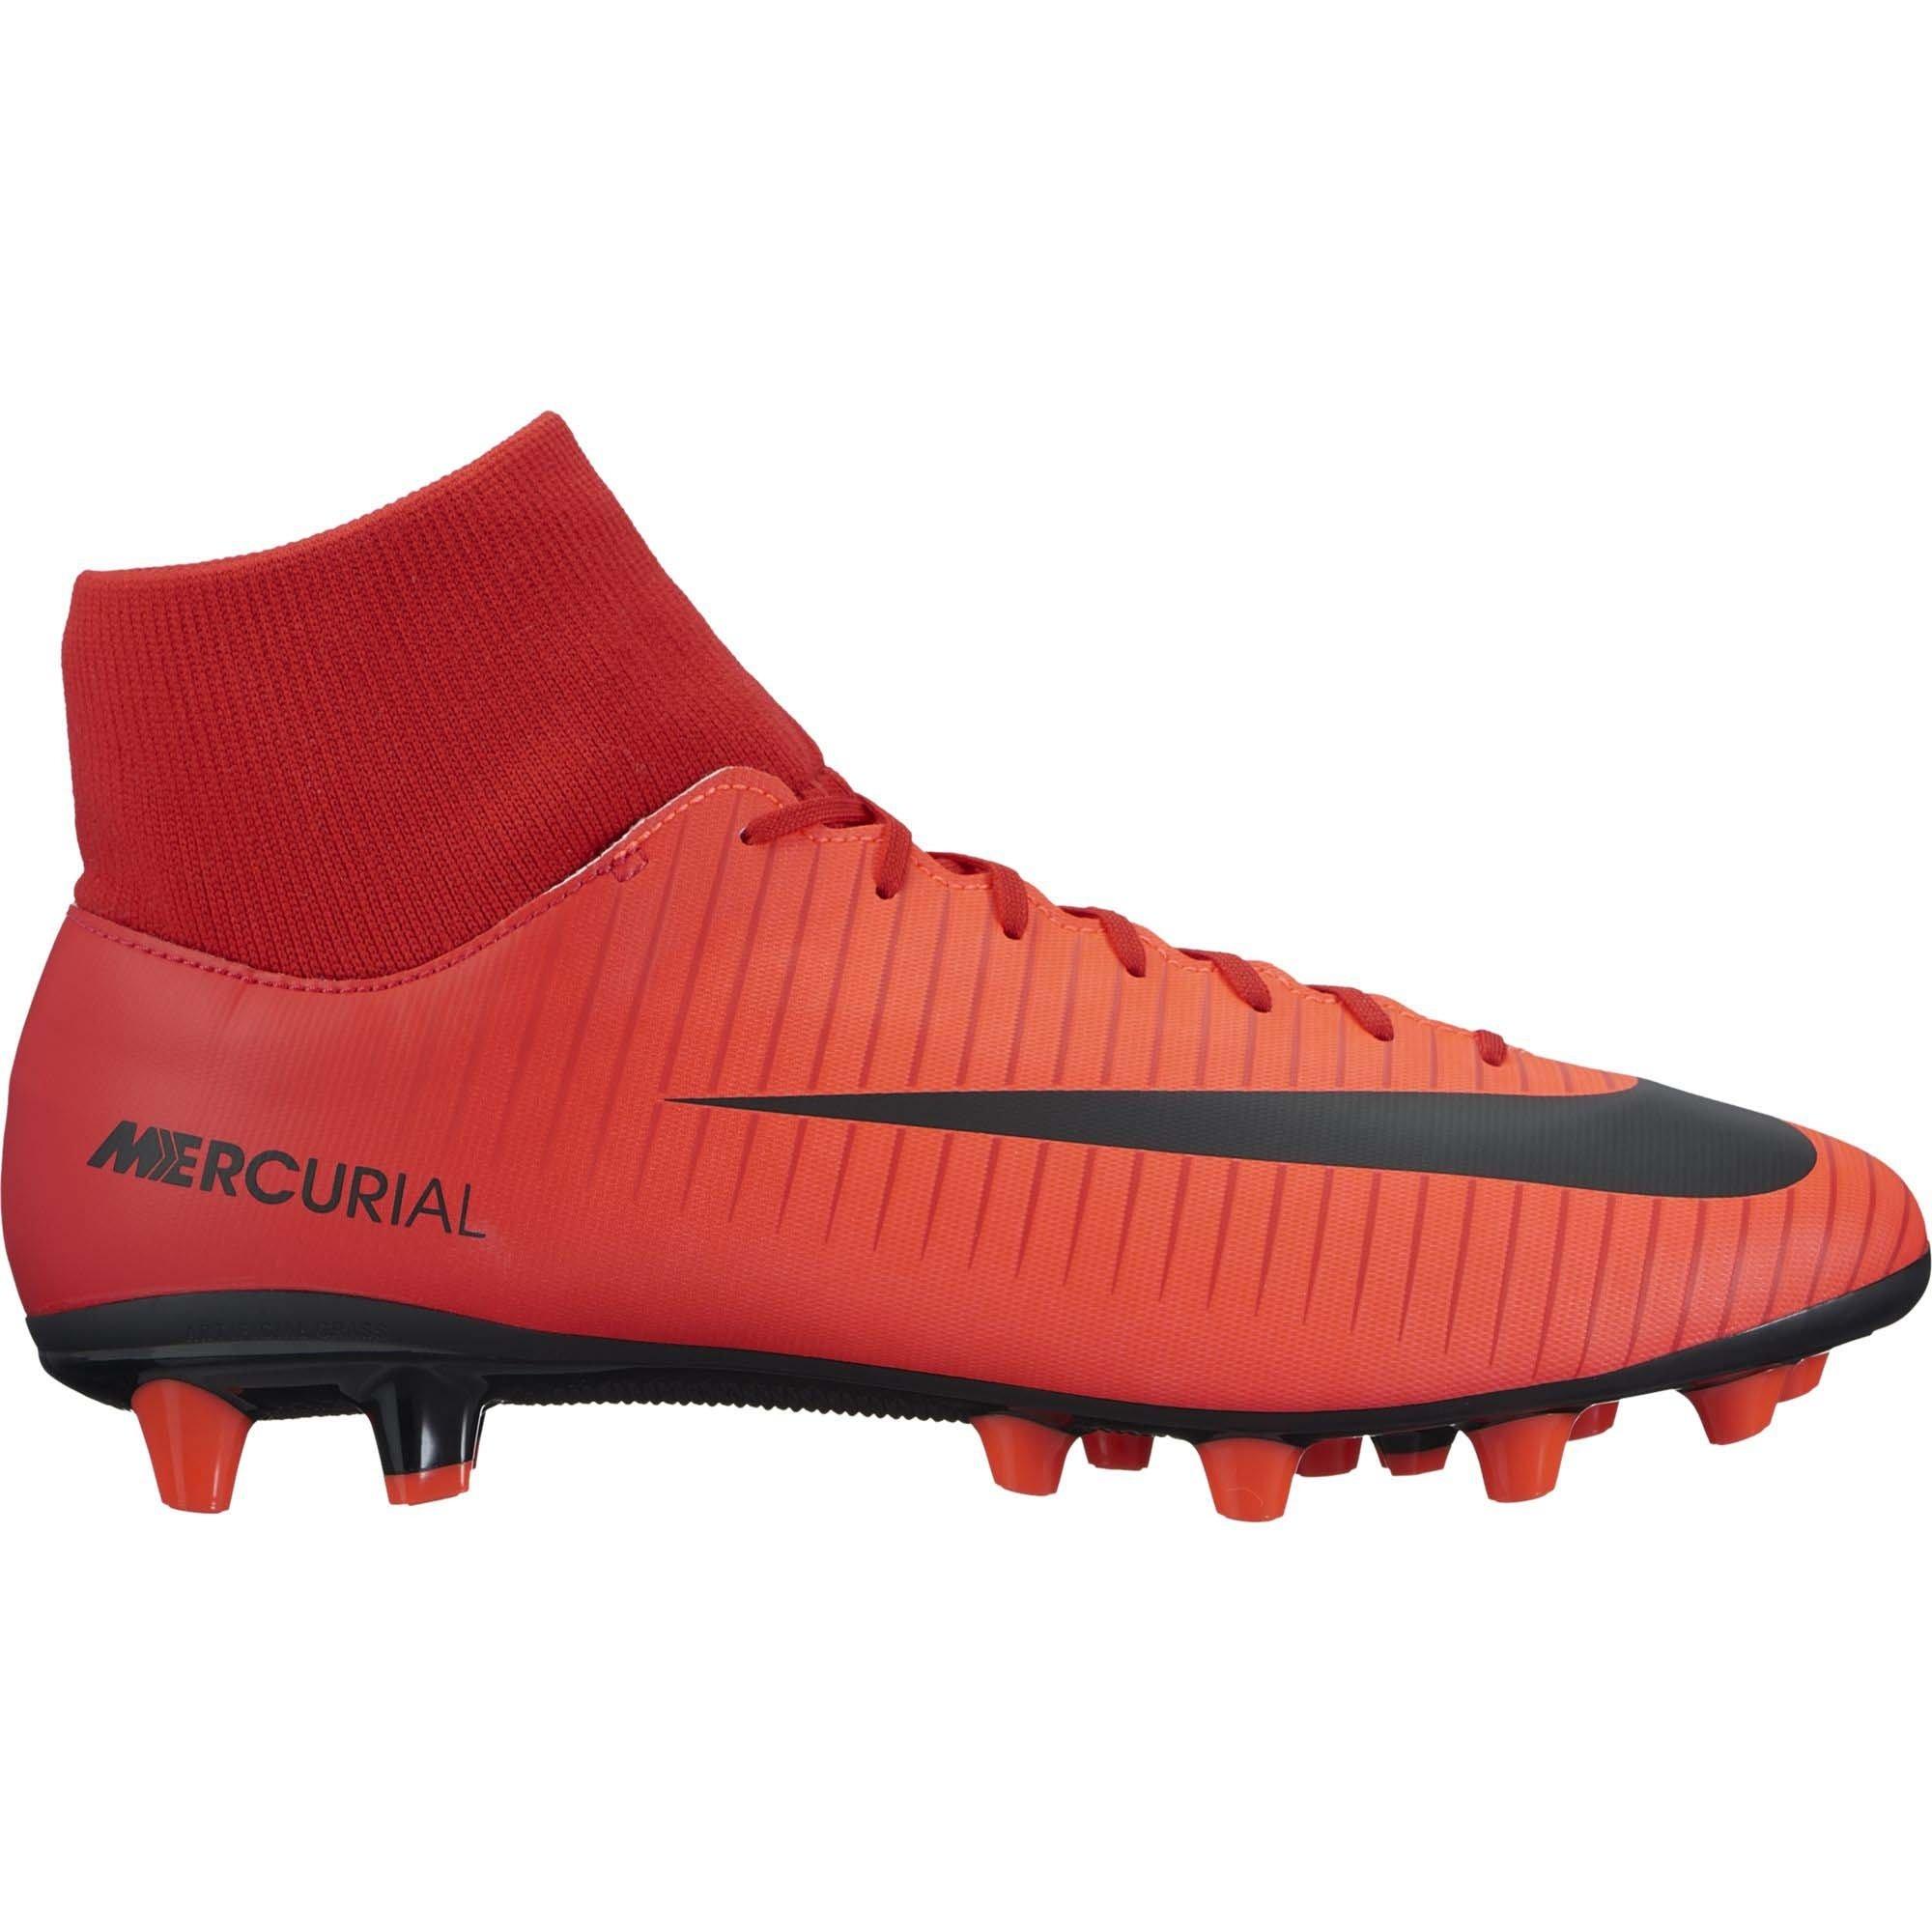 NIKE MERCURIAL VICTORY VI DF AGPRO 903608-616 - Deportes Liverpool db2233daddcd0